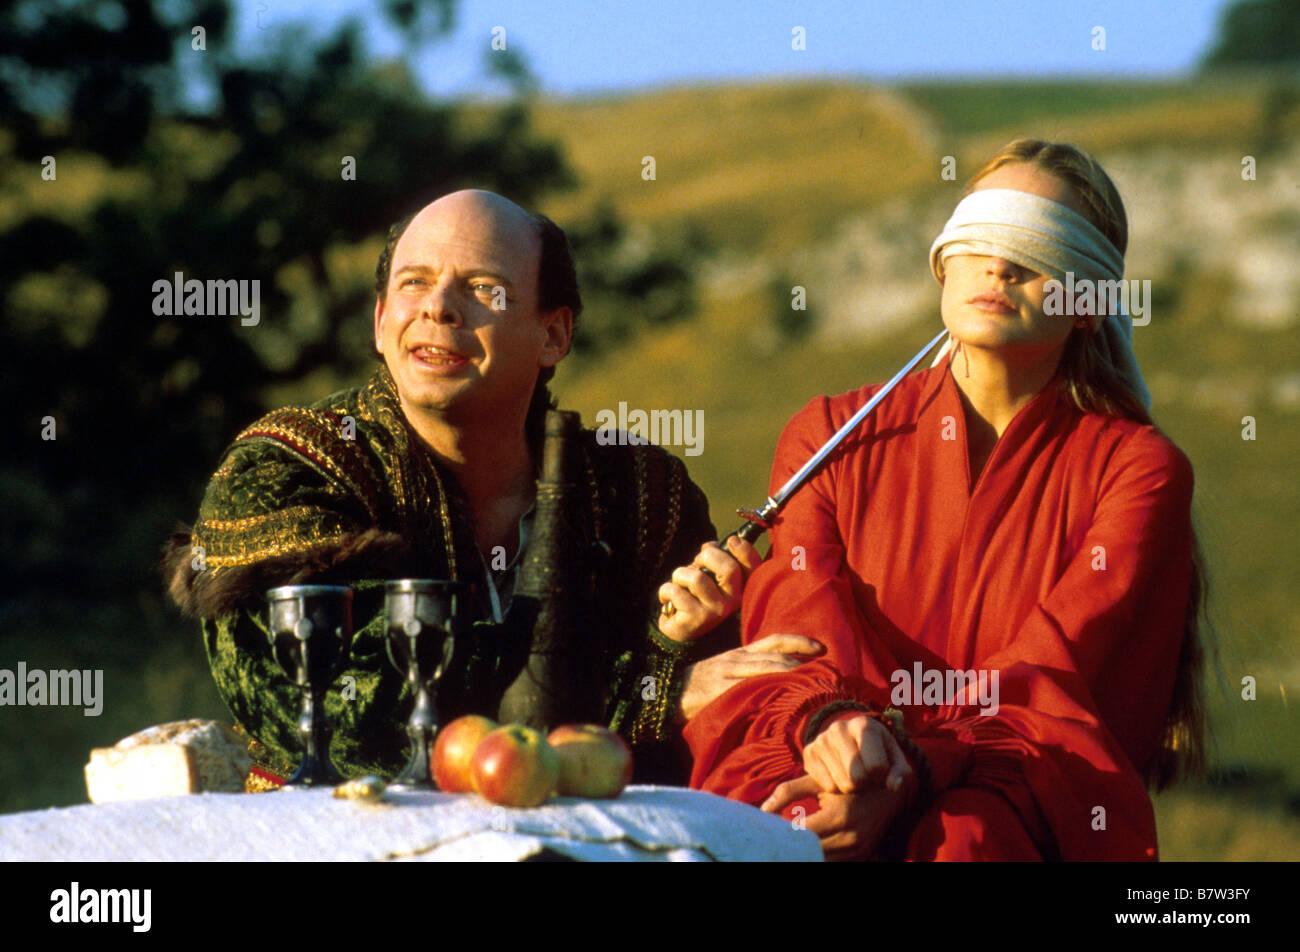 The Princess Bride  Year: 1987 USA Wallace Shawn, Robin Wright Penn  Director: Rob Reiner Stock Photo